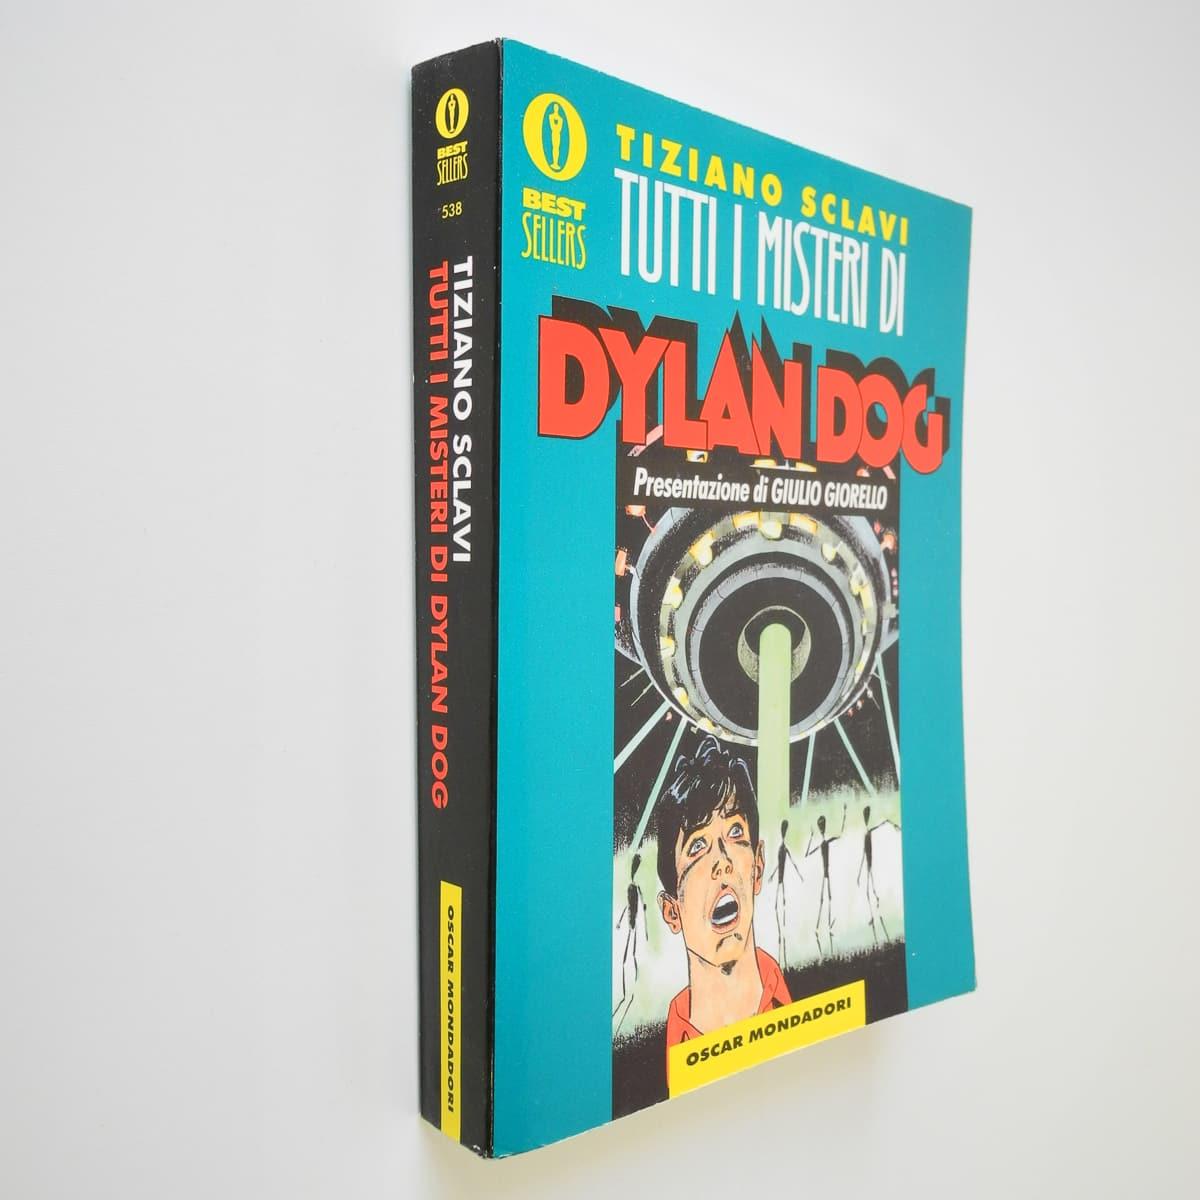 Dylan Dog Tutti i Misteri Oscar Mondadori